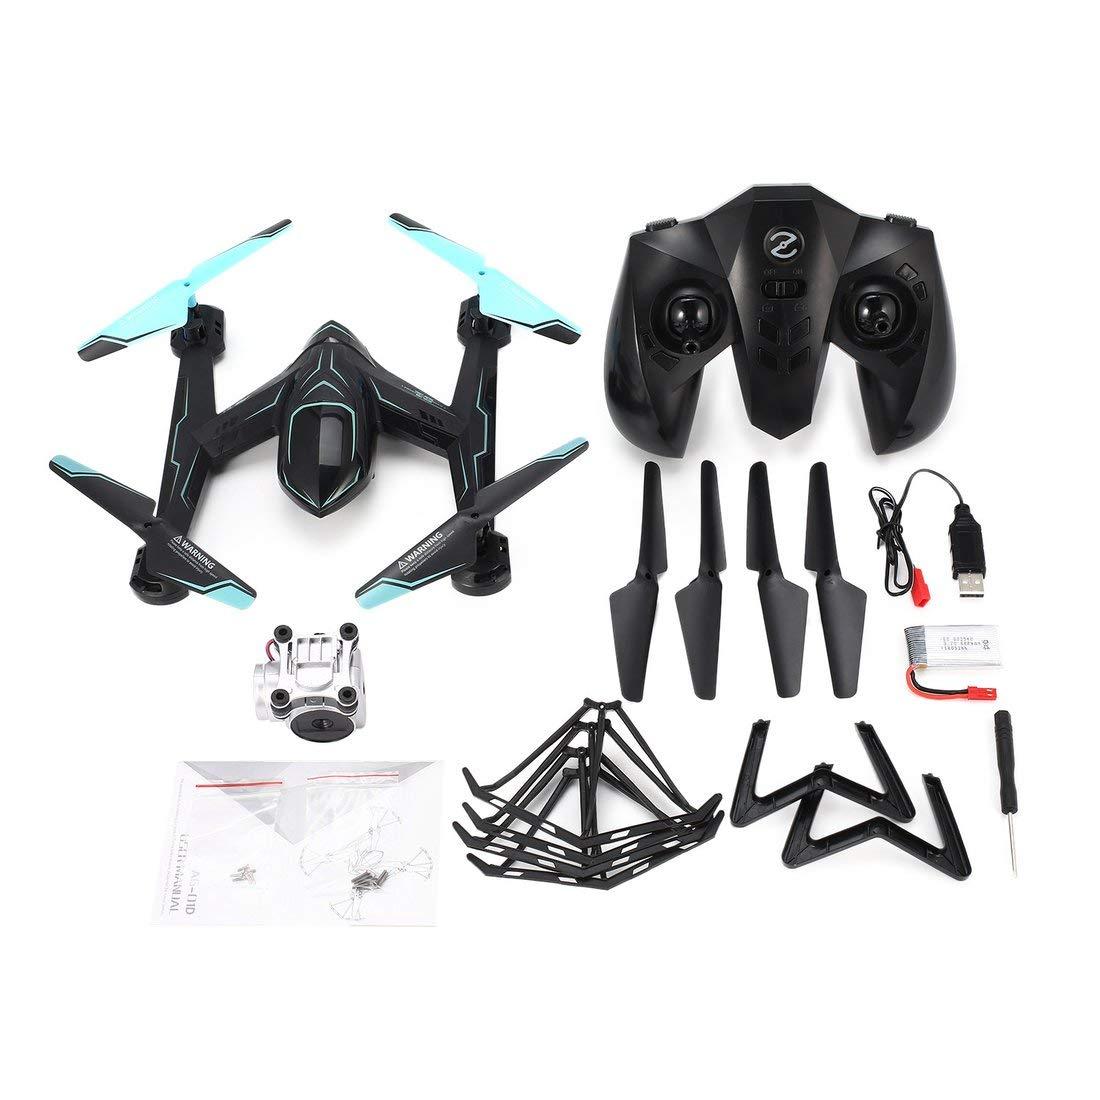 Formulaone AG-01DW FPV Kamera Selfie Höhe Halten Drohne Headless Mode 3D Flips Ein Schlüssel Return Hovering H / L Geschwindigkeitsschalter RC Quadcopter